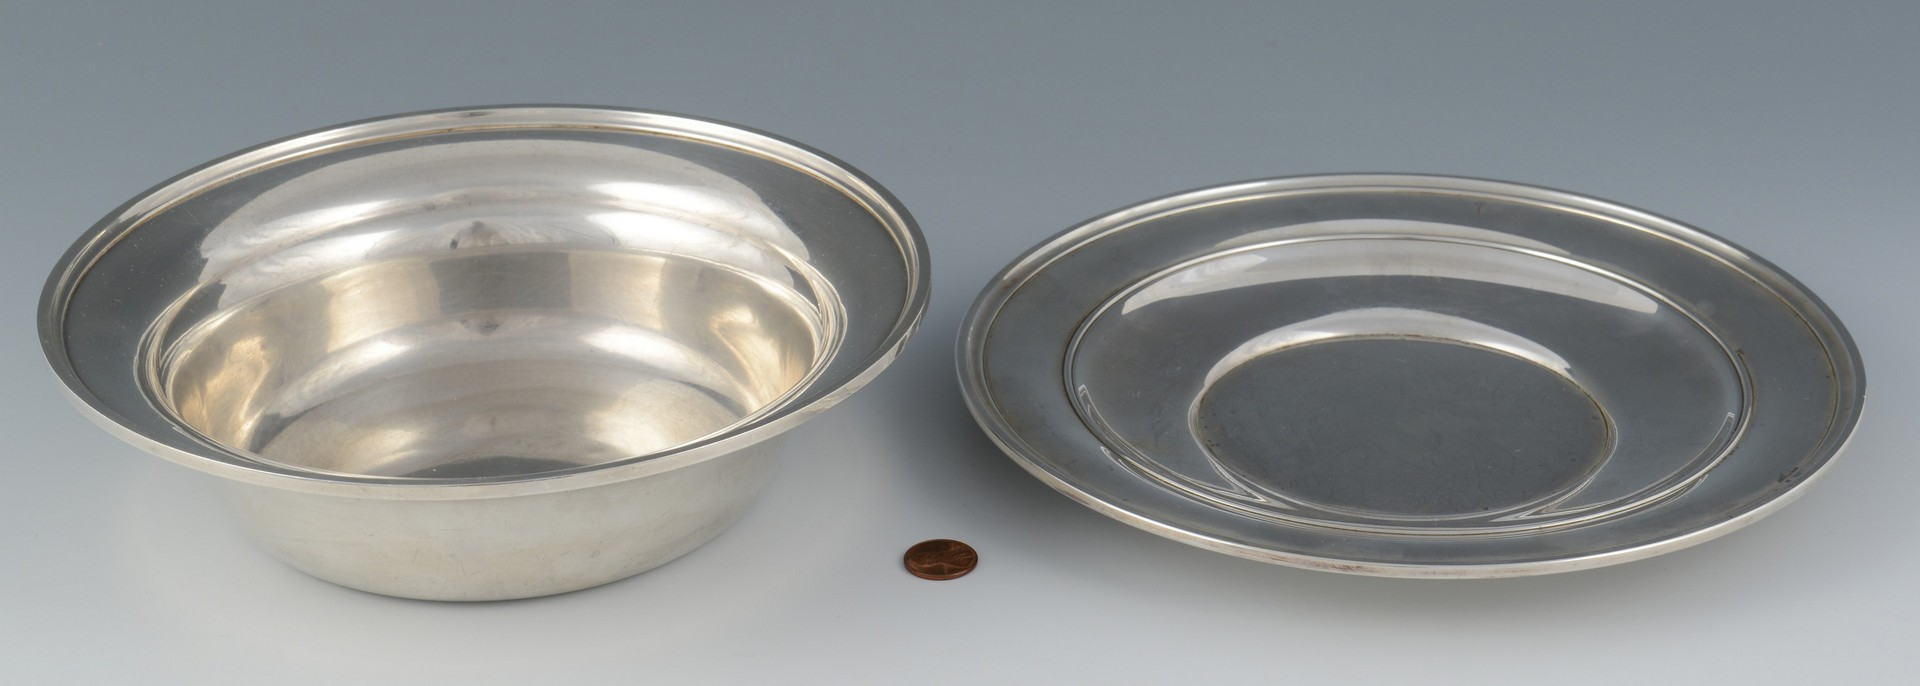 Lot 3594266: 2 pcs Sterling Silver Hollowware